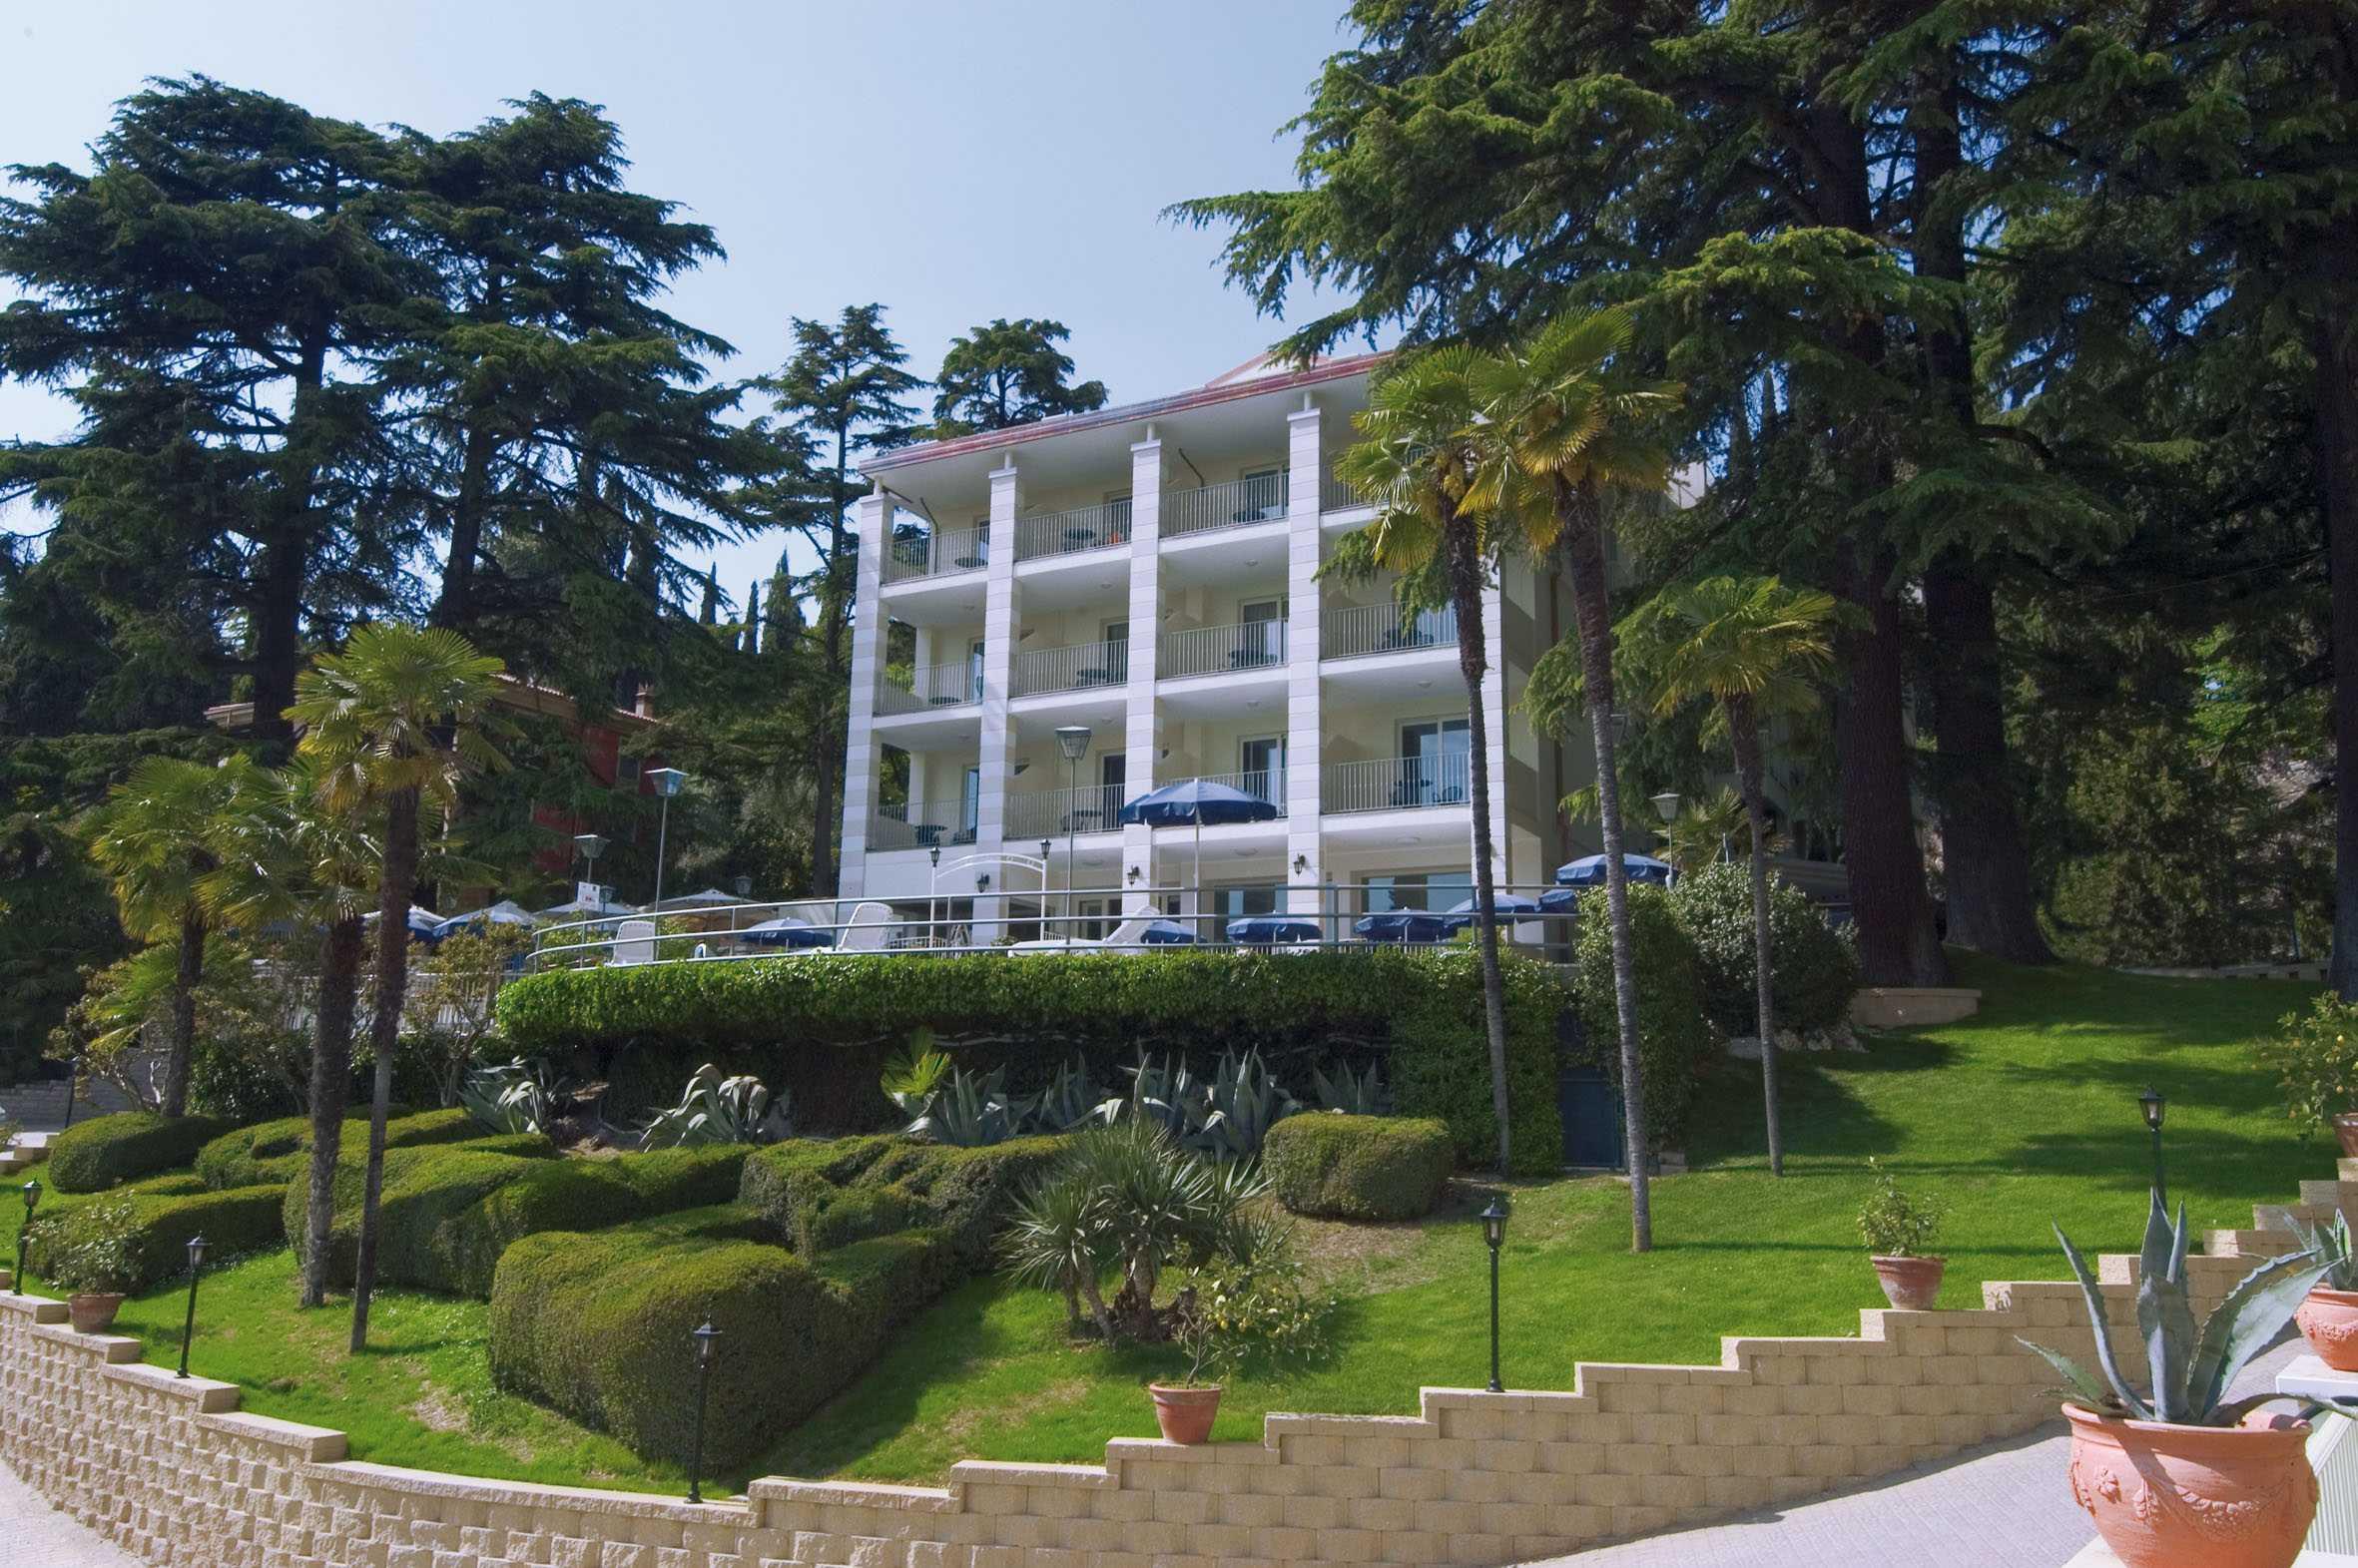 Hotel Excelsior Le Terrazze - Garda - Foto 1